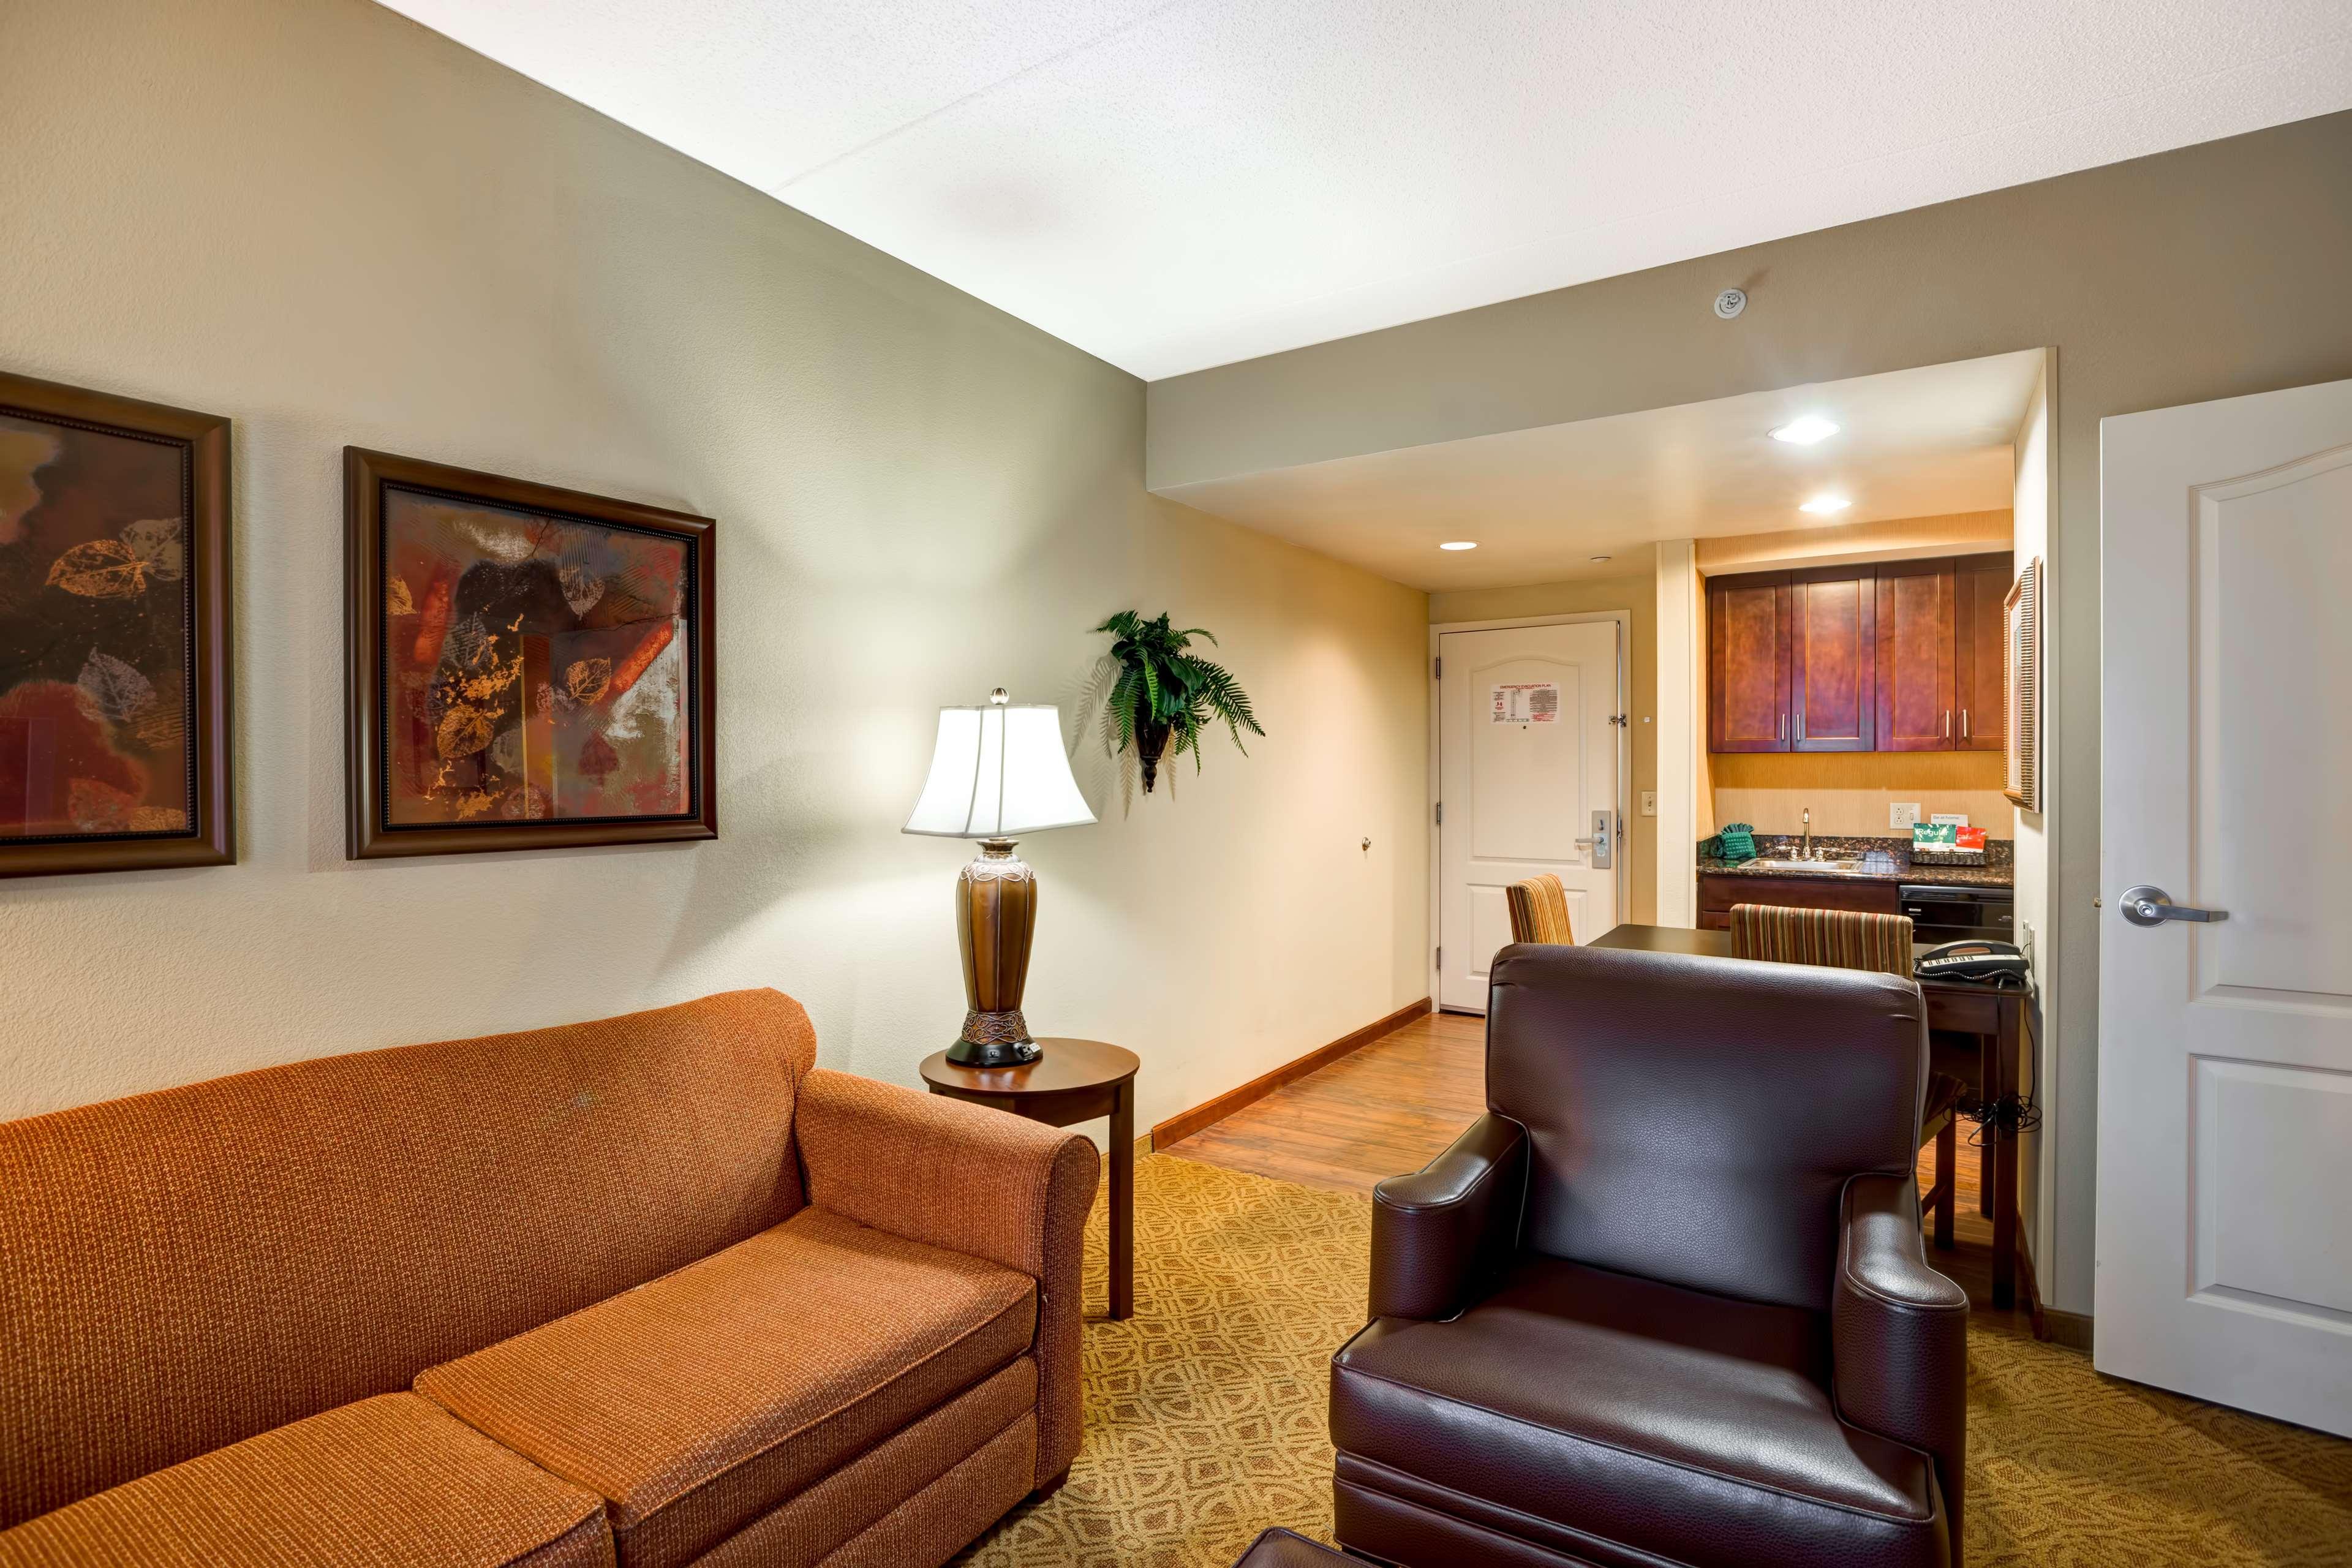 Homewood Suites by Hilton Fredericksburg image 39